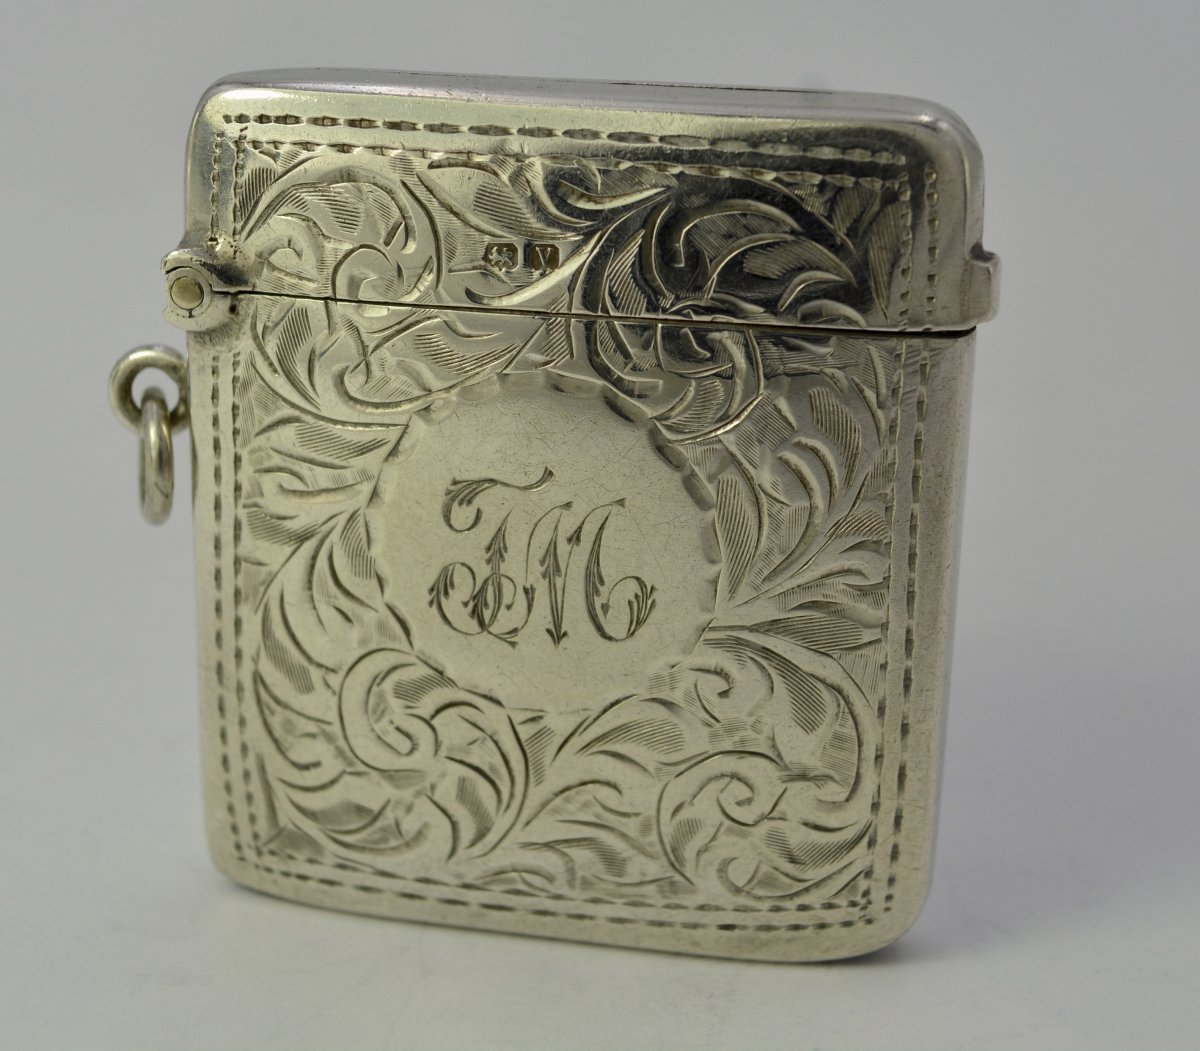 English Silver Matchbox / Pyrogen Circa 1920